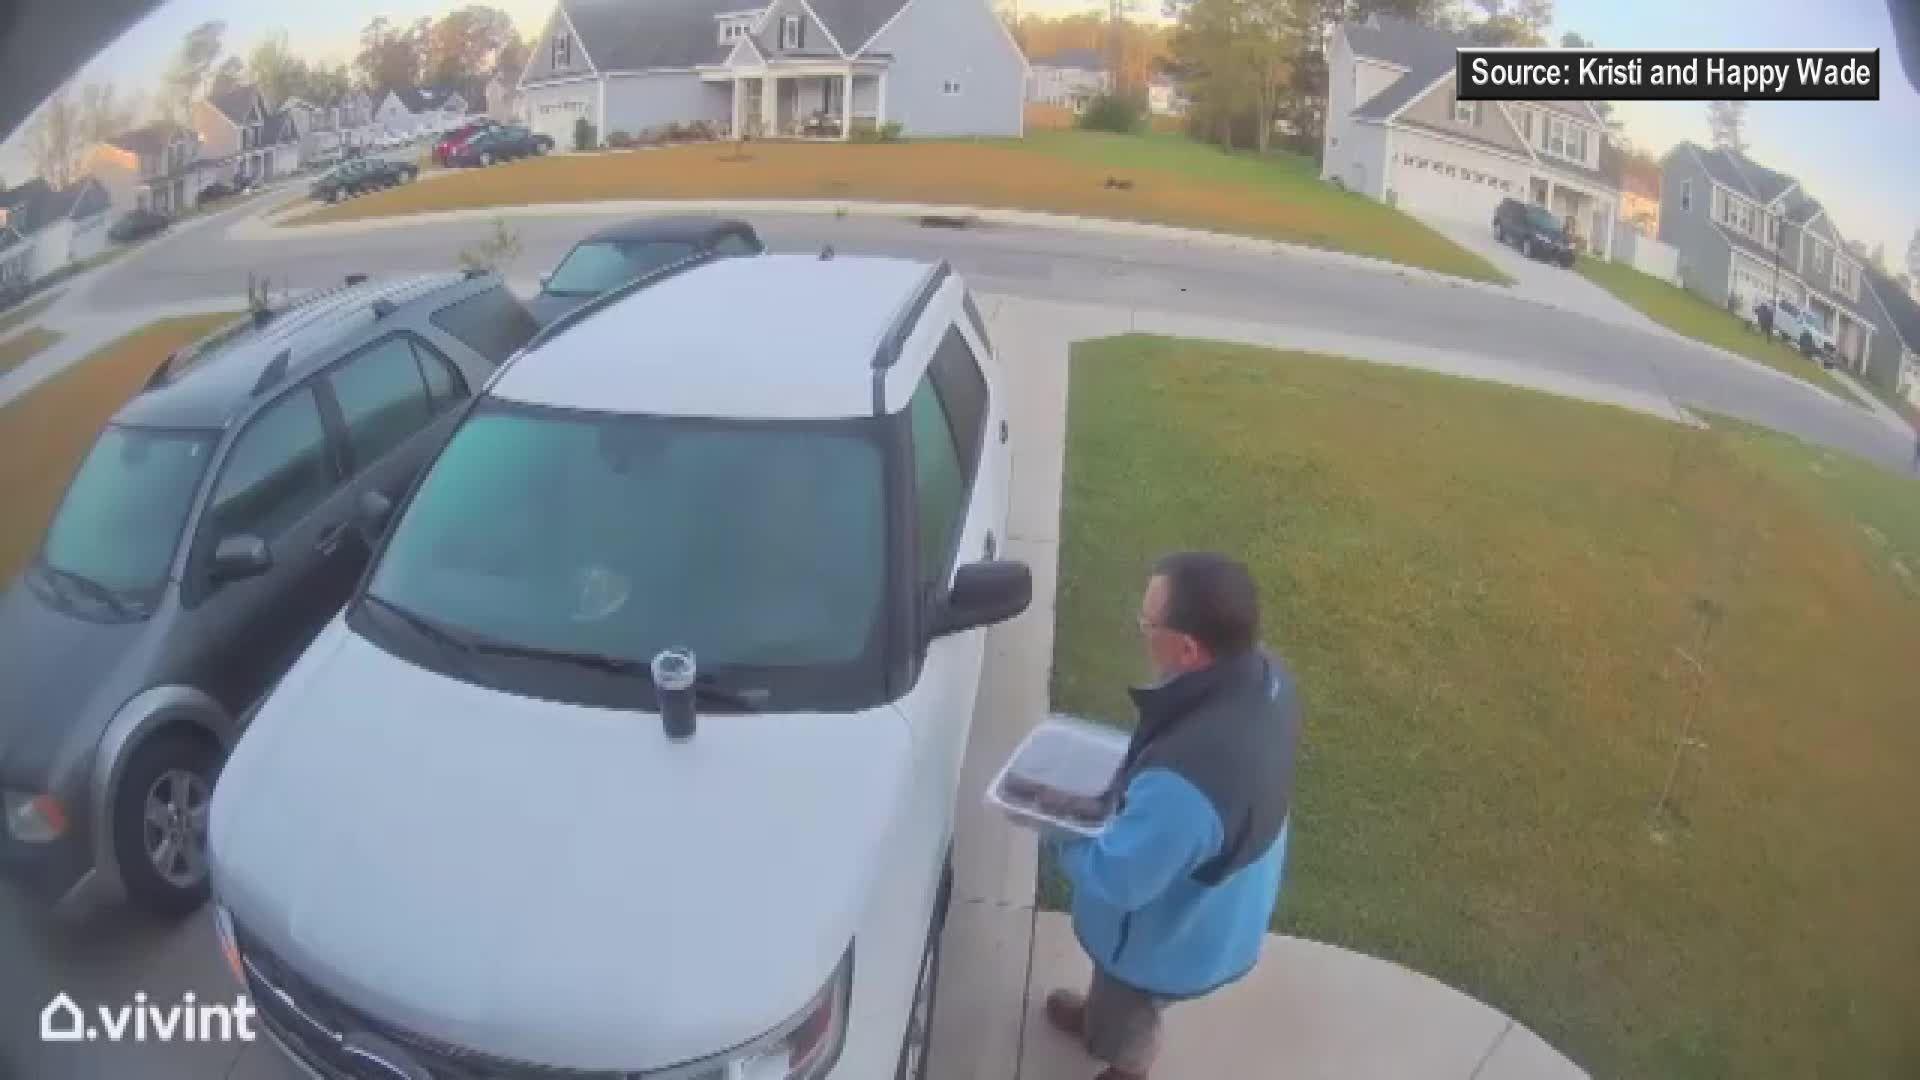 North Carolina couple attacked by rabid bobcat in neighborhood